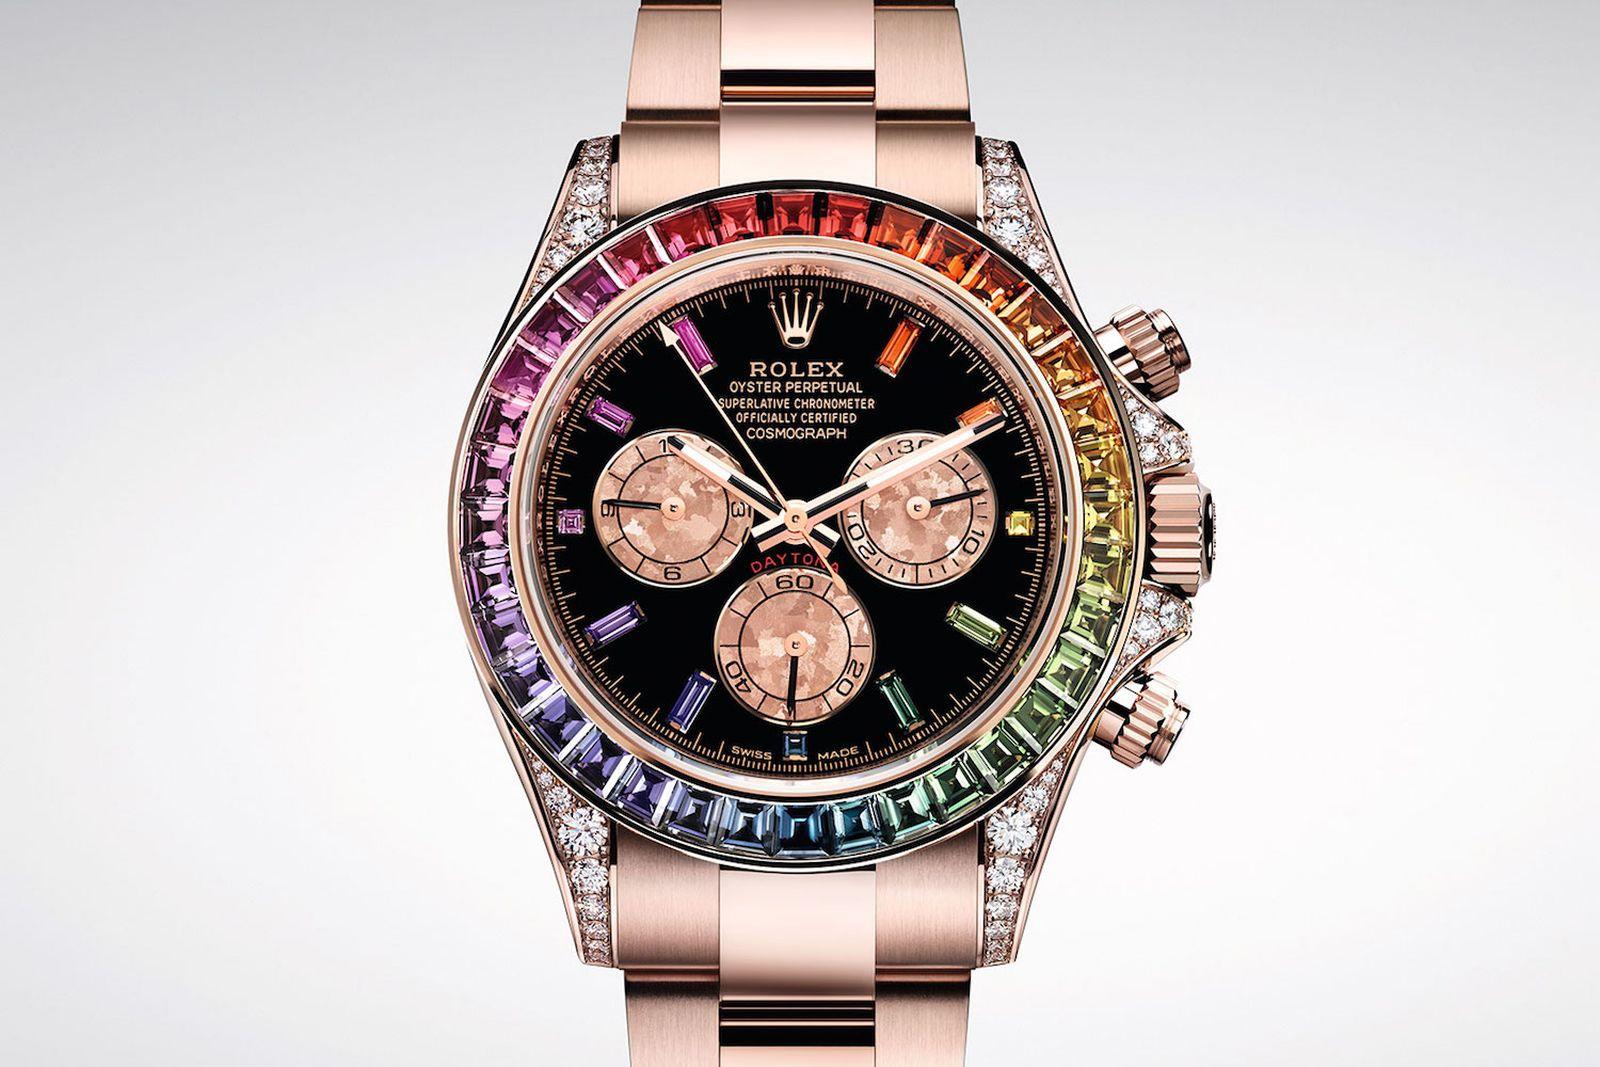 rolex-rainbow-daytona-everose-116595-rbow-01